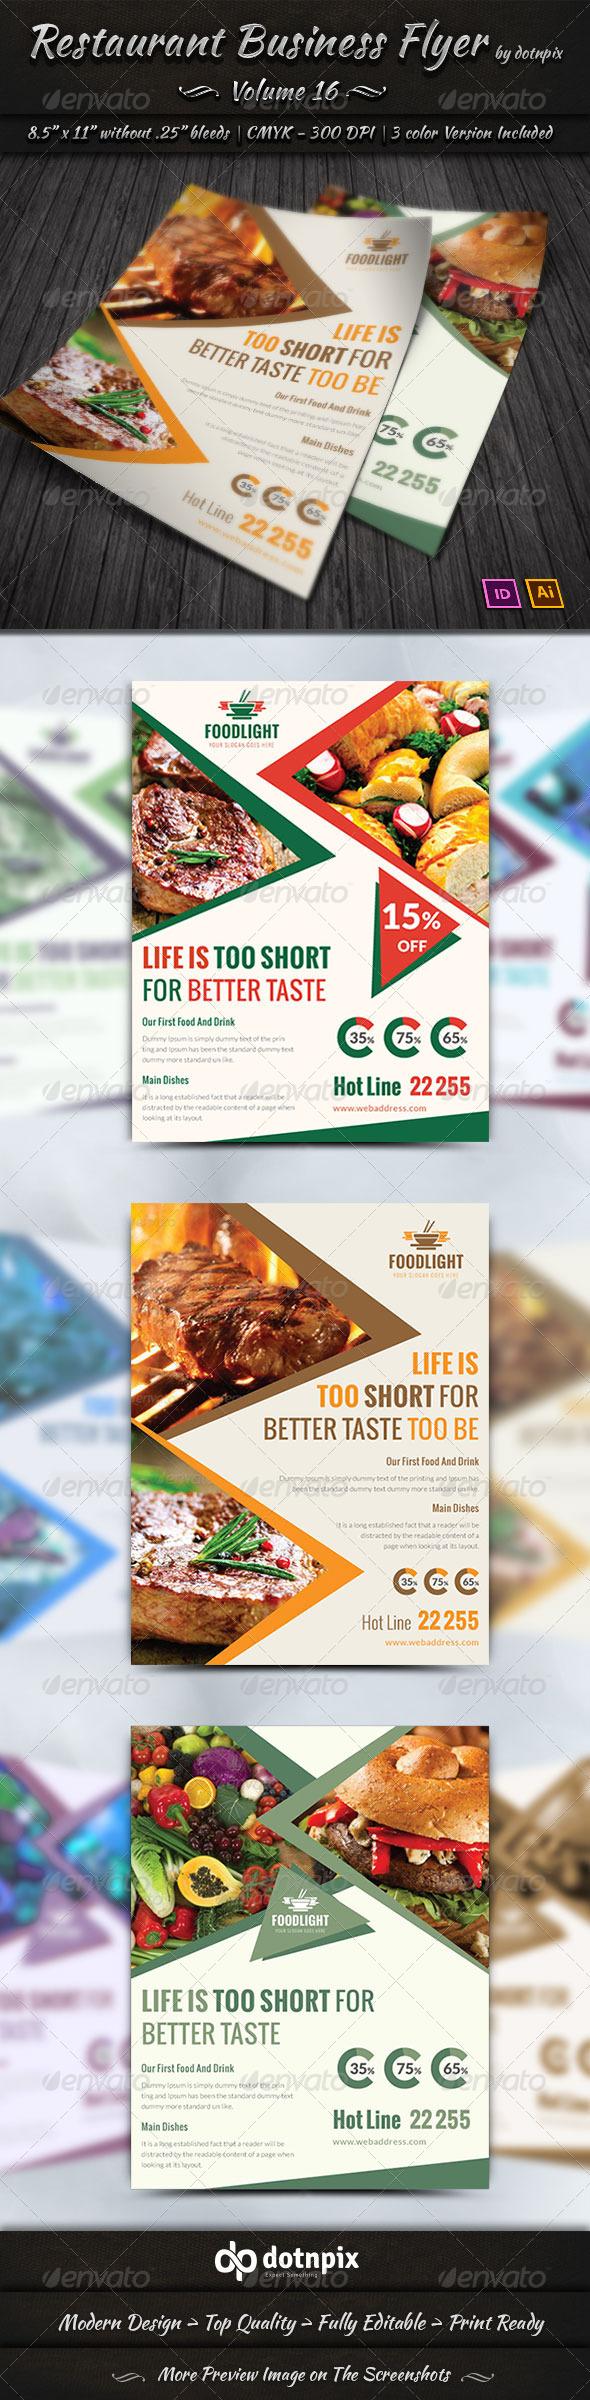 Restaurant Business Flyer   Volume 16 - Print Templates